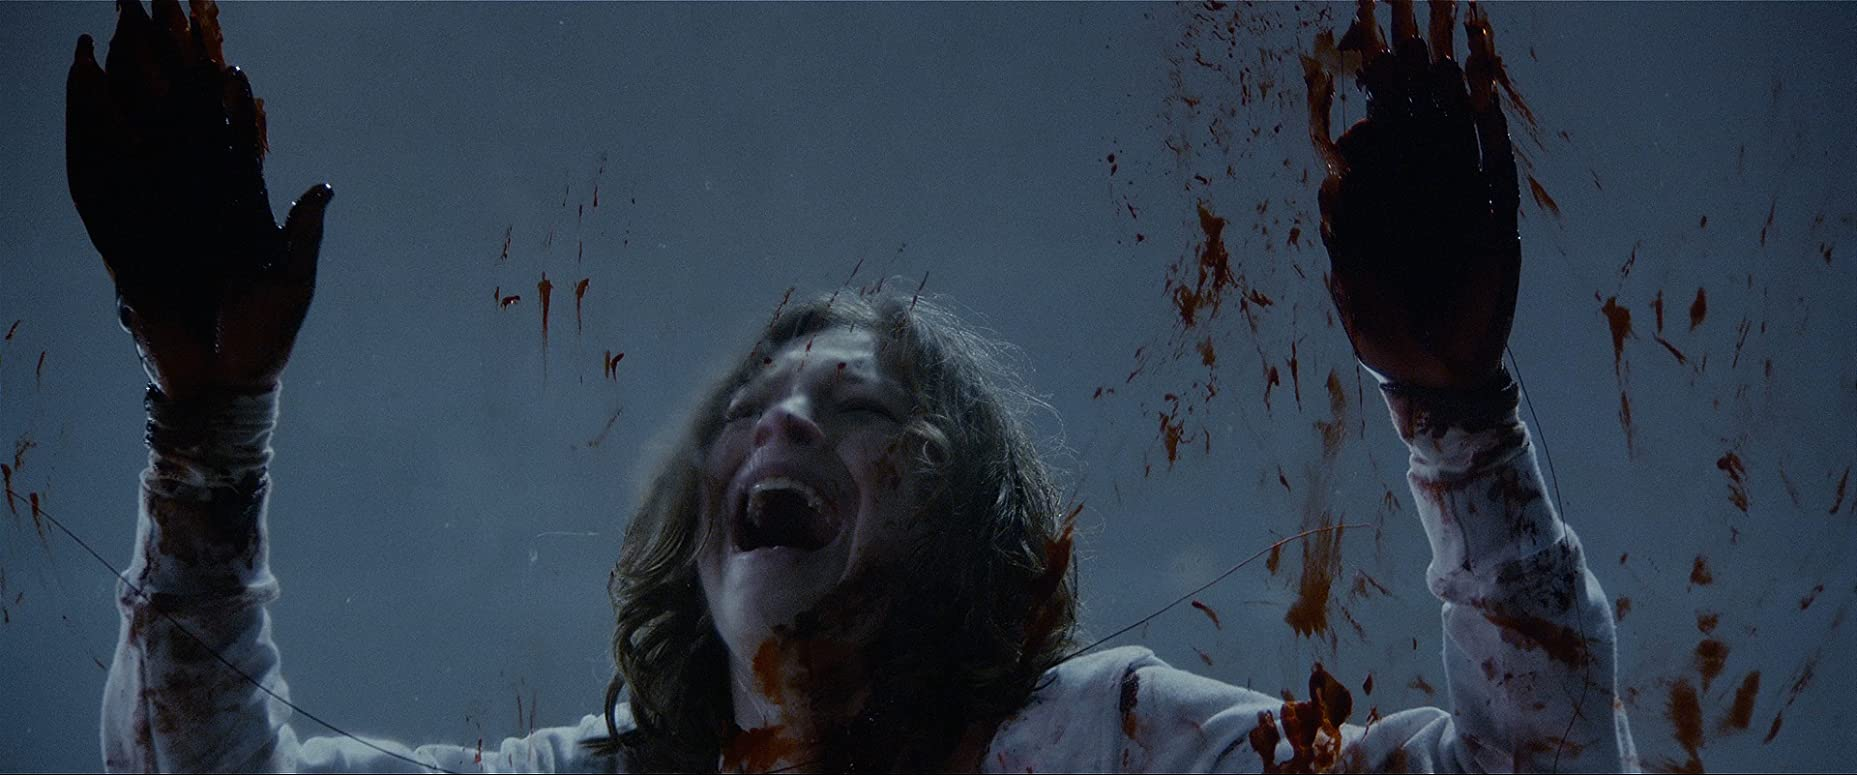 IFC Midnight's #Horror - Trailer 3